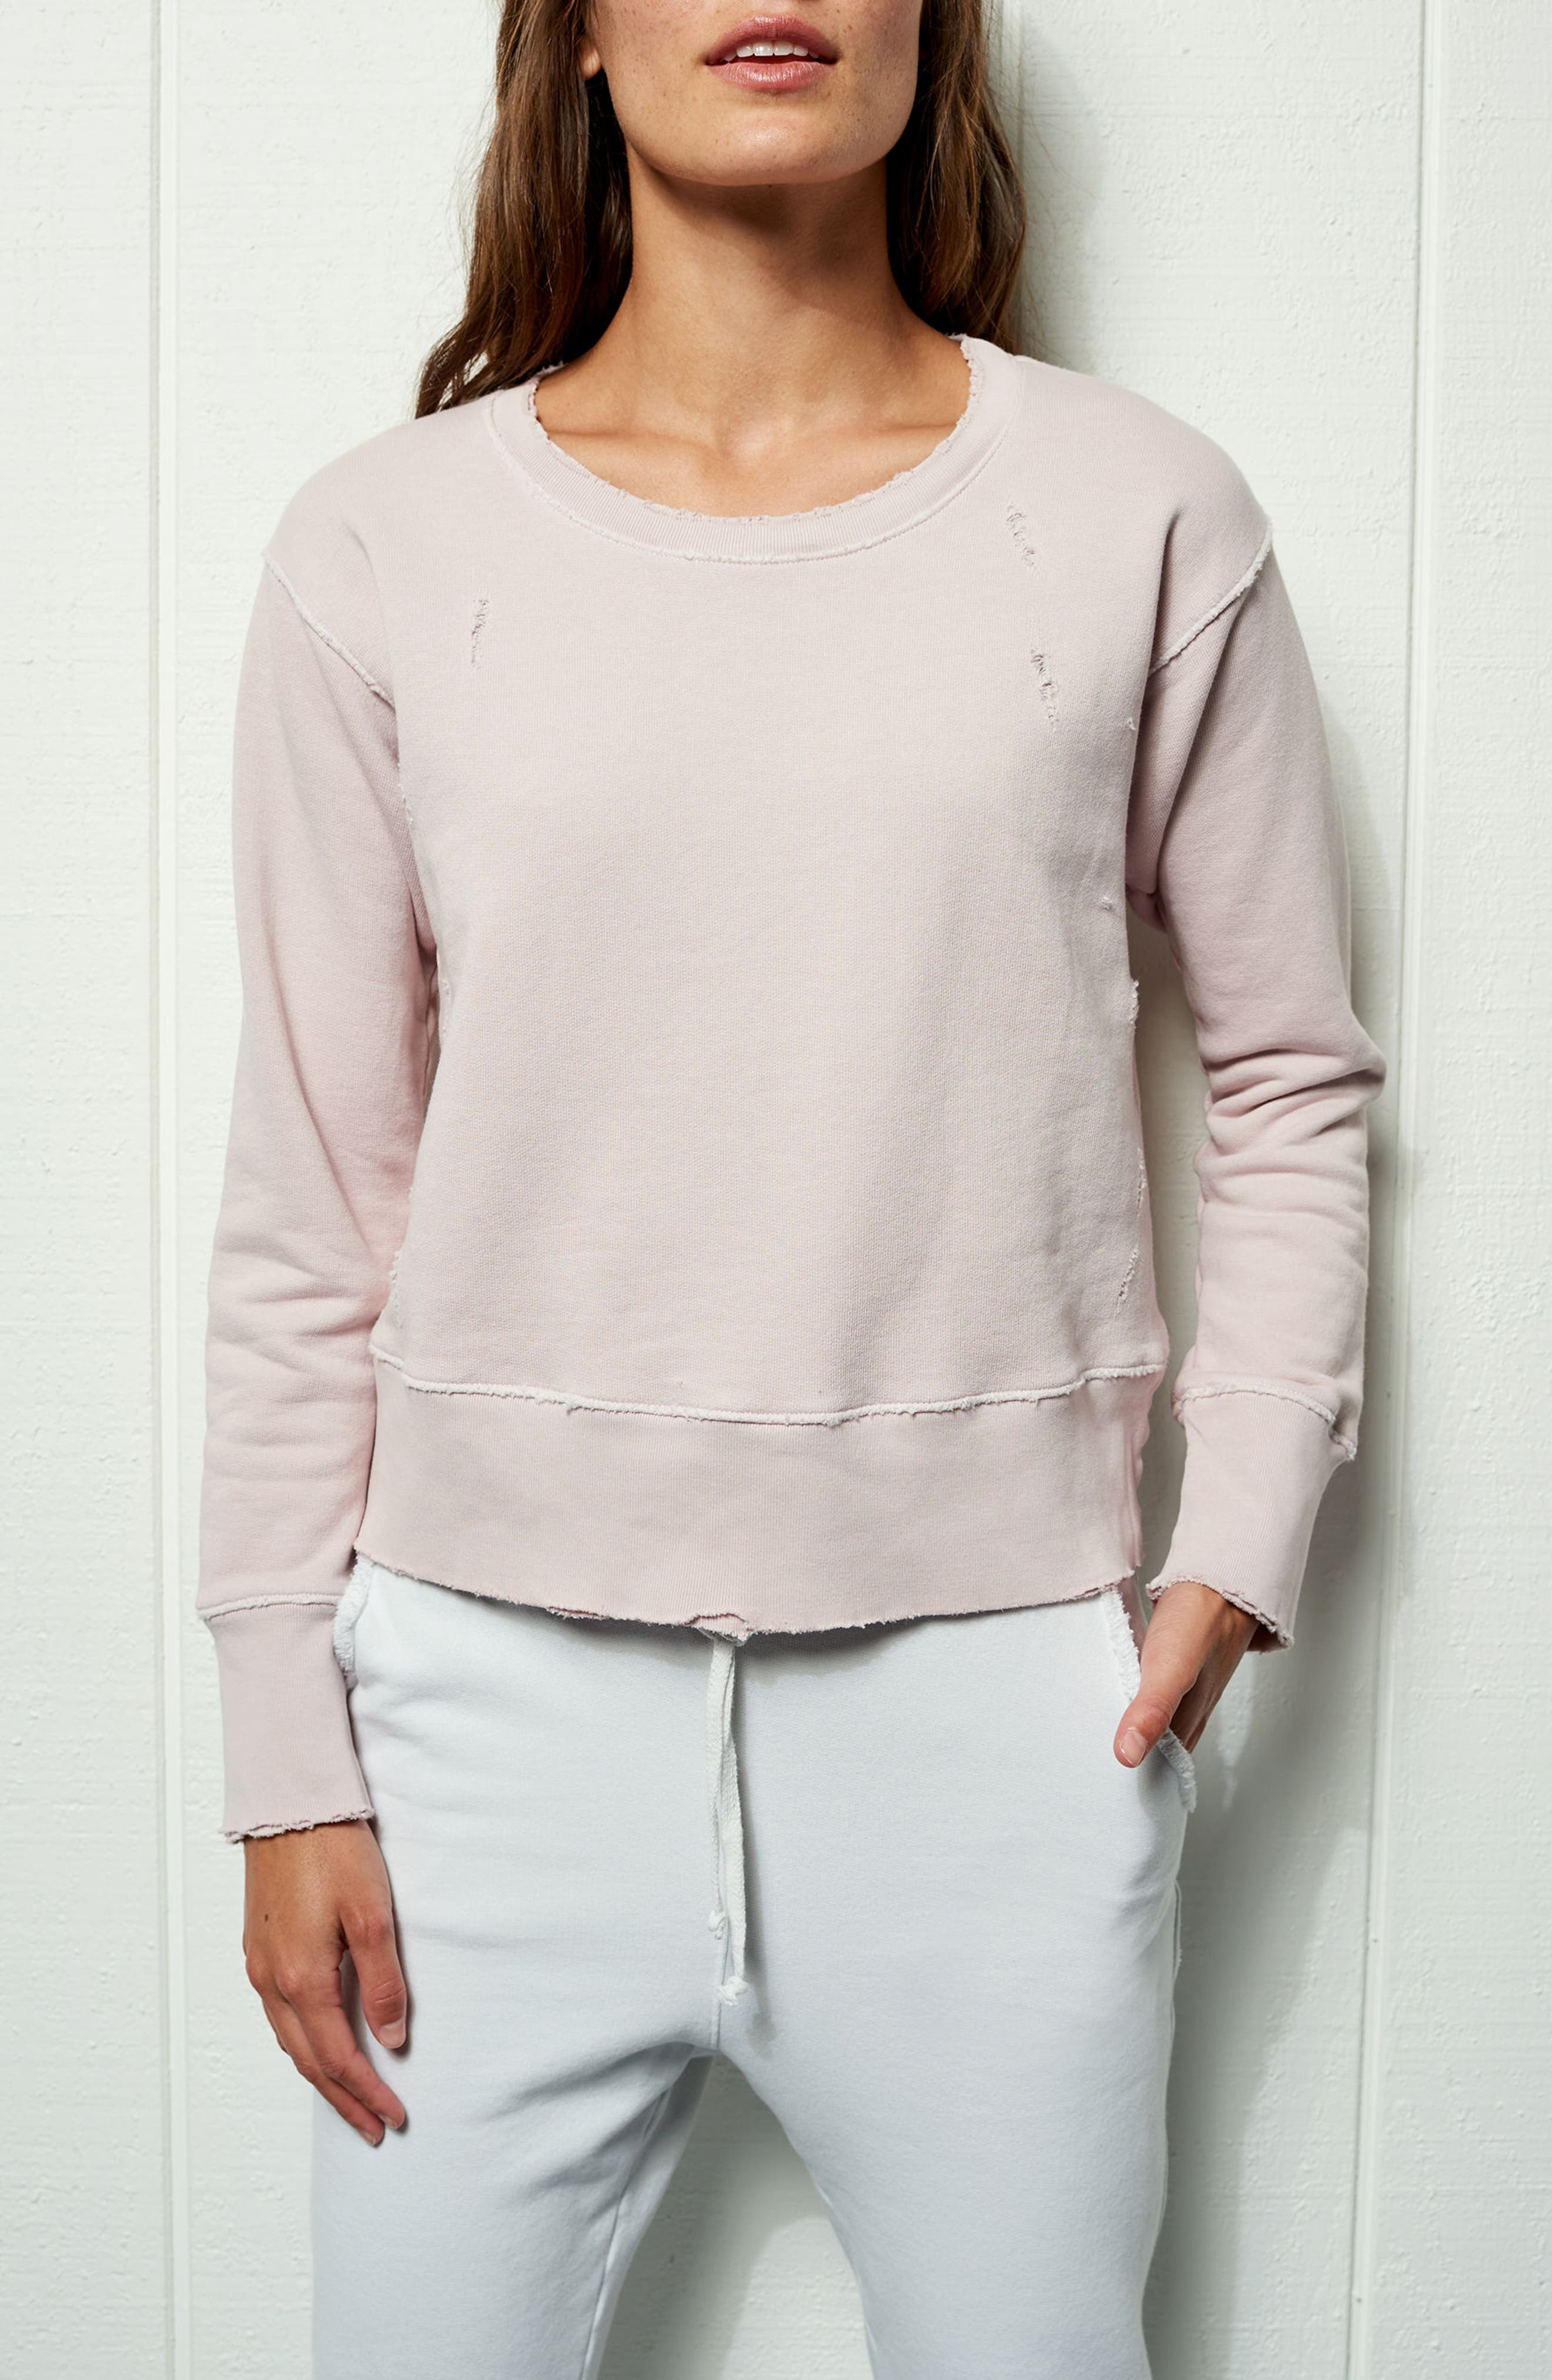 Tee Lab Cotton Sweatshirt,                             Alternate thumbnail 8, color,